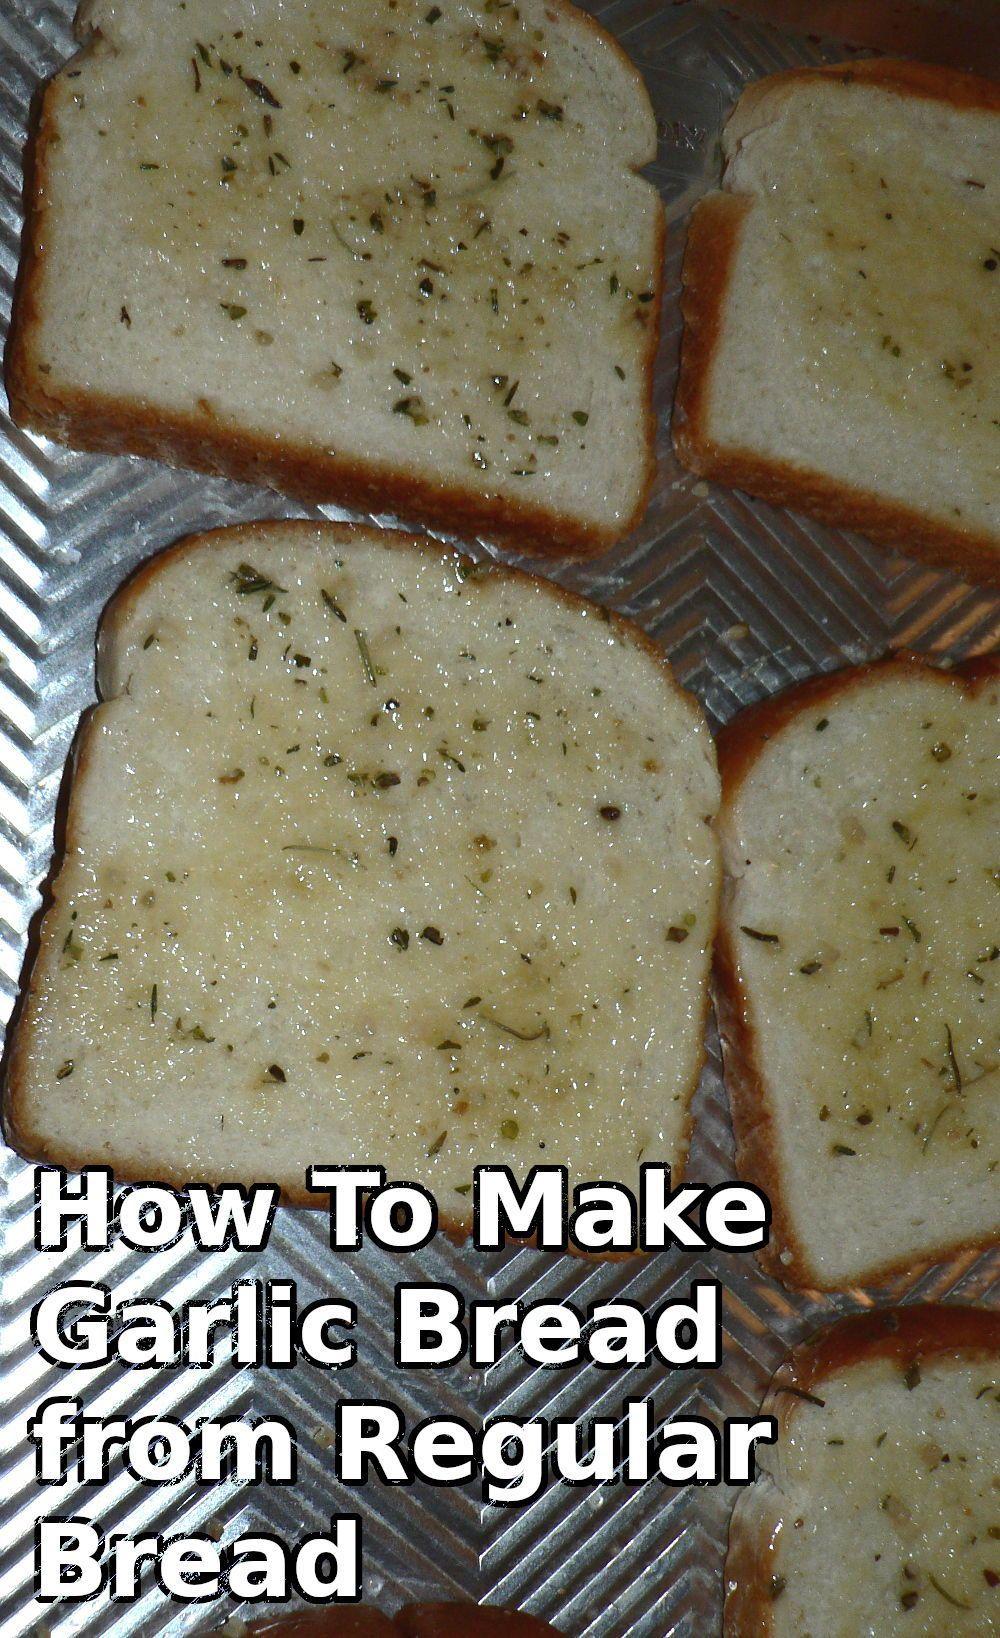 How To Make Cheesy Garlic Bread With Regular Bread Recipe Homemade Garlic Bread Garlic Bread Easy Bread Recipes Homemade